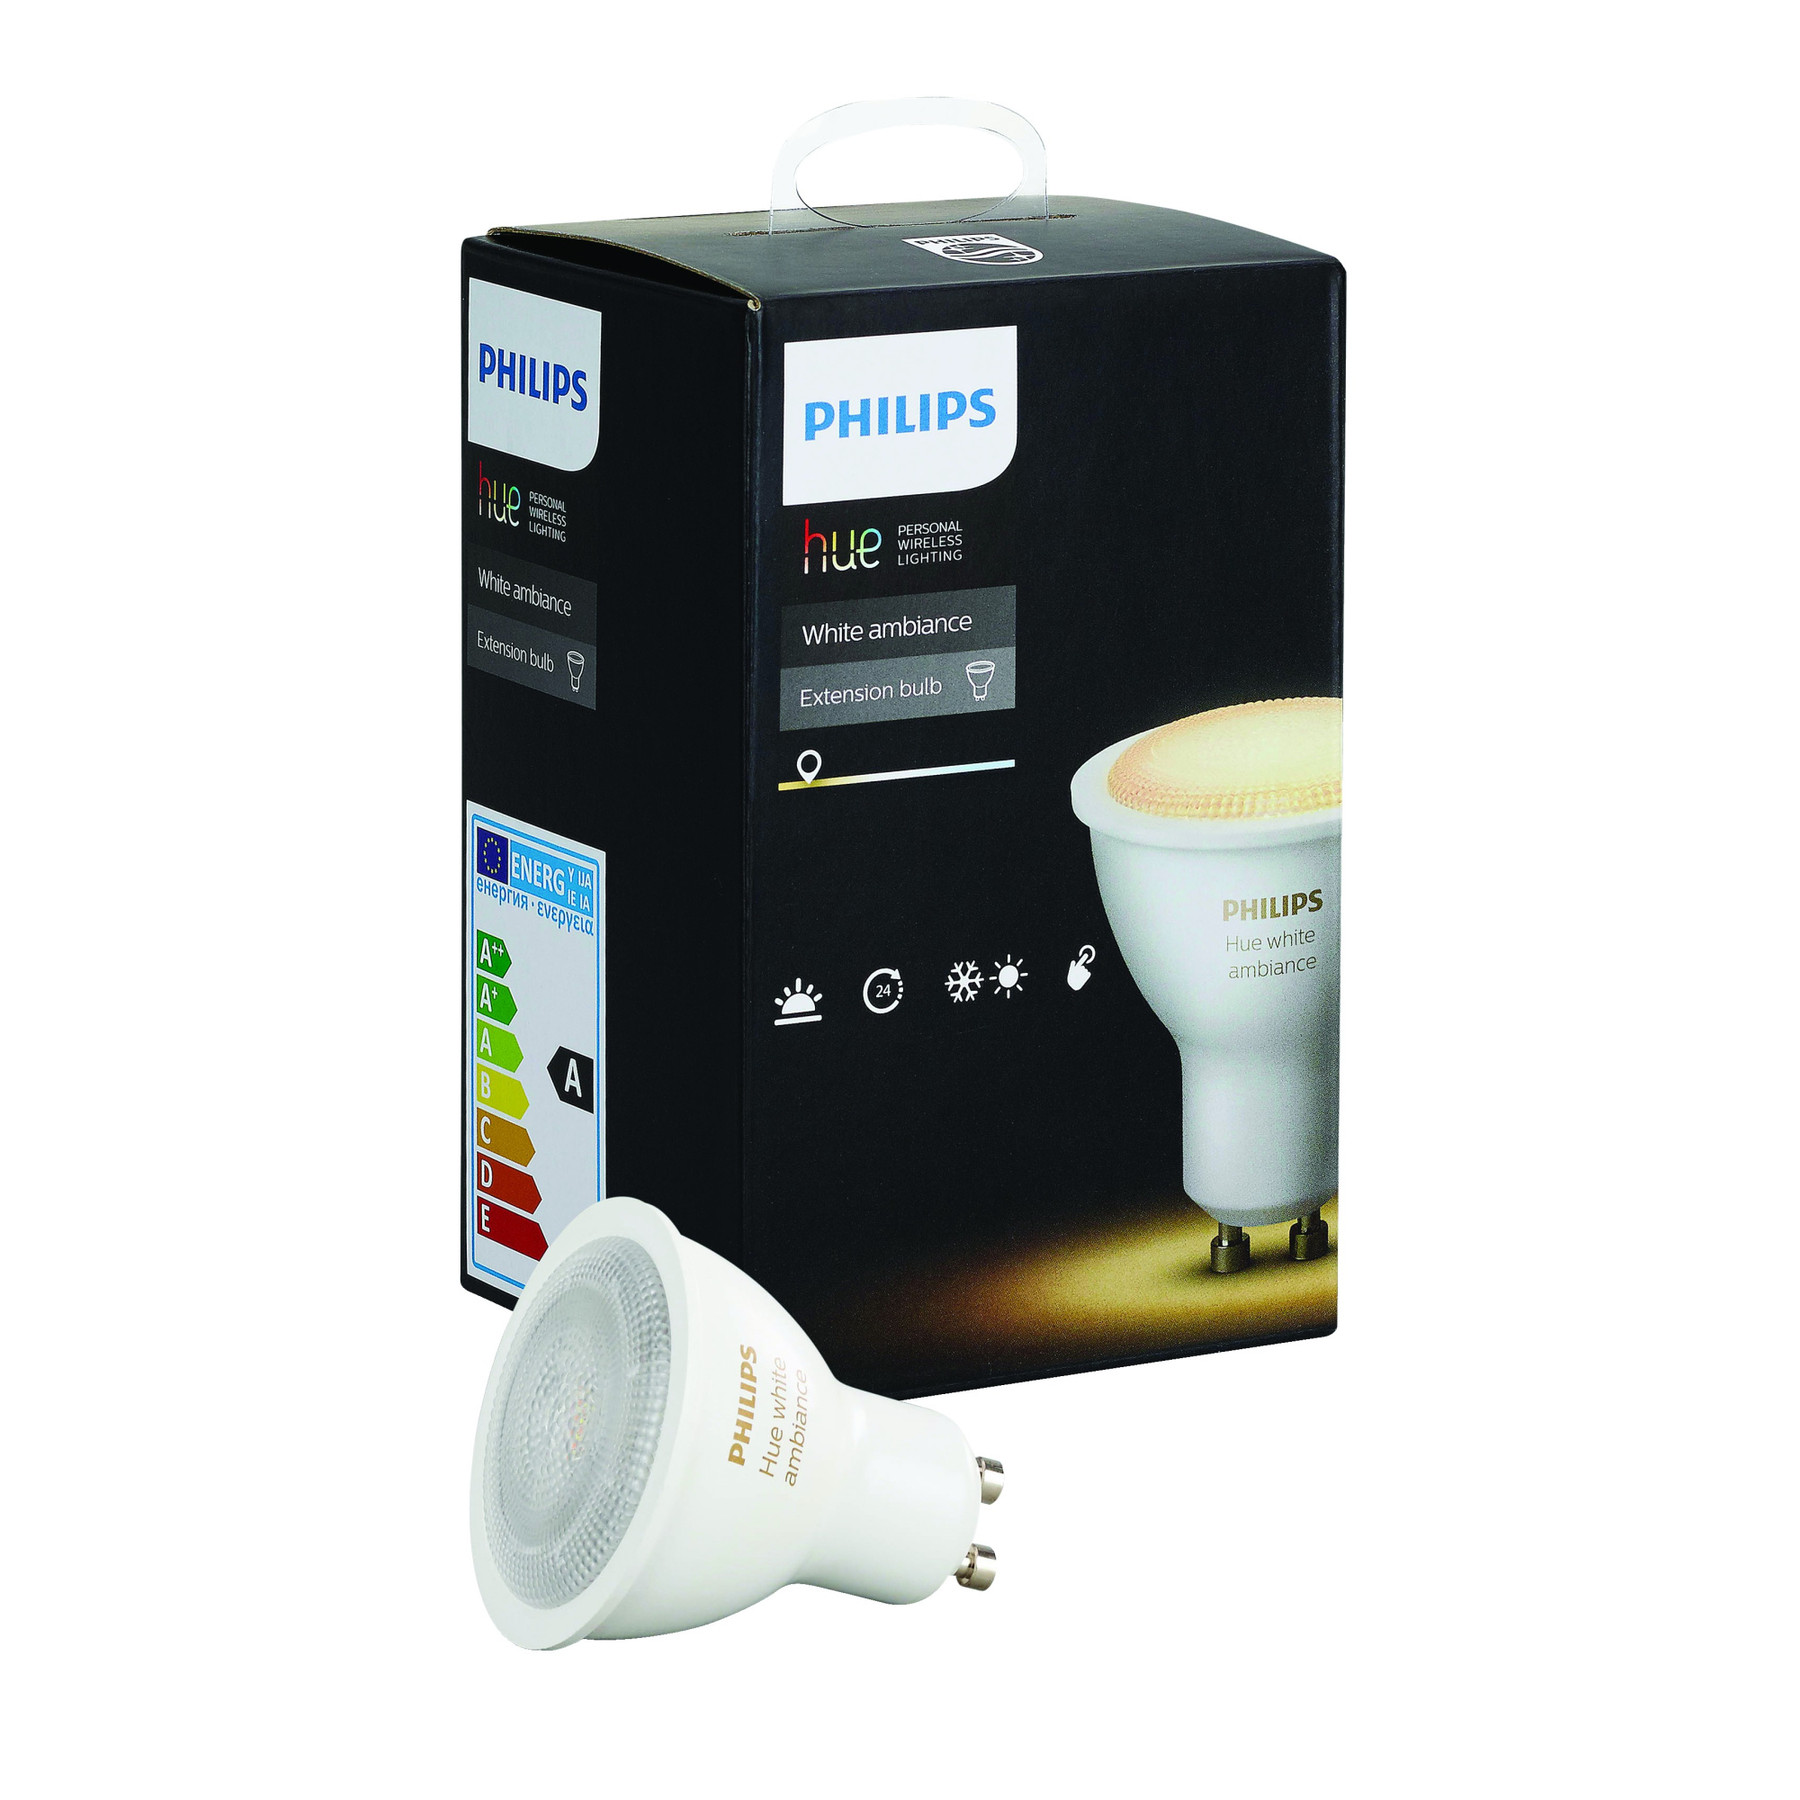 philips hue white ambiance led smart light bulb gu10 ebay. Black Bedroom Furniture Sets. Home Design Ideas